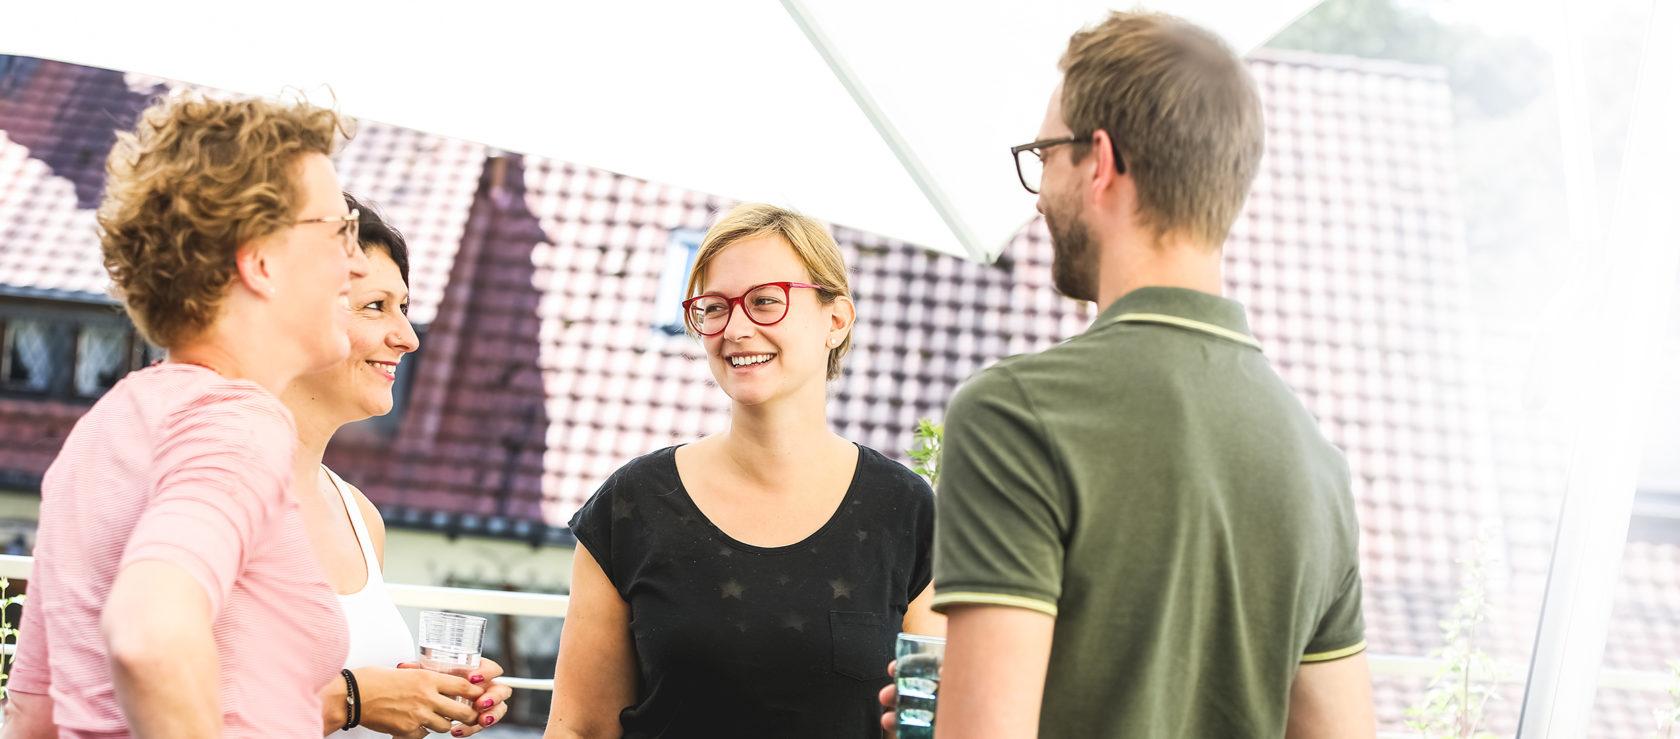 Karriere Digitale Beratung Steuerberater Lightouse Steuerberatung Bergisch Gladbach